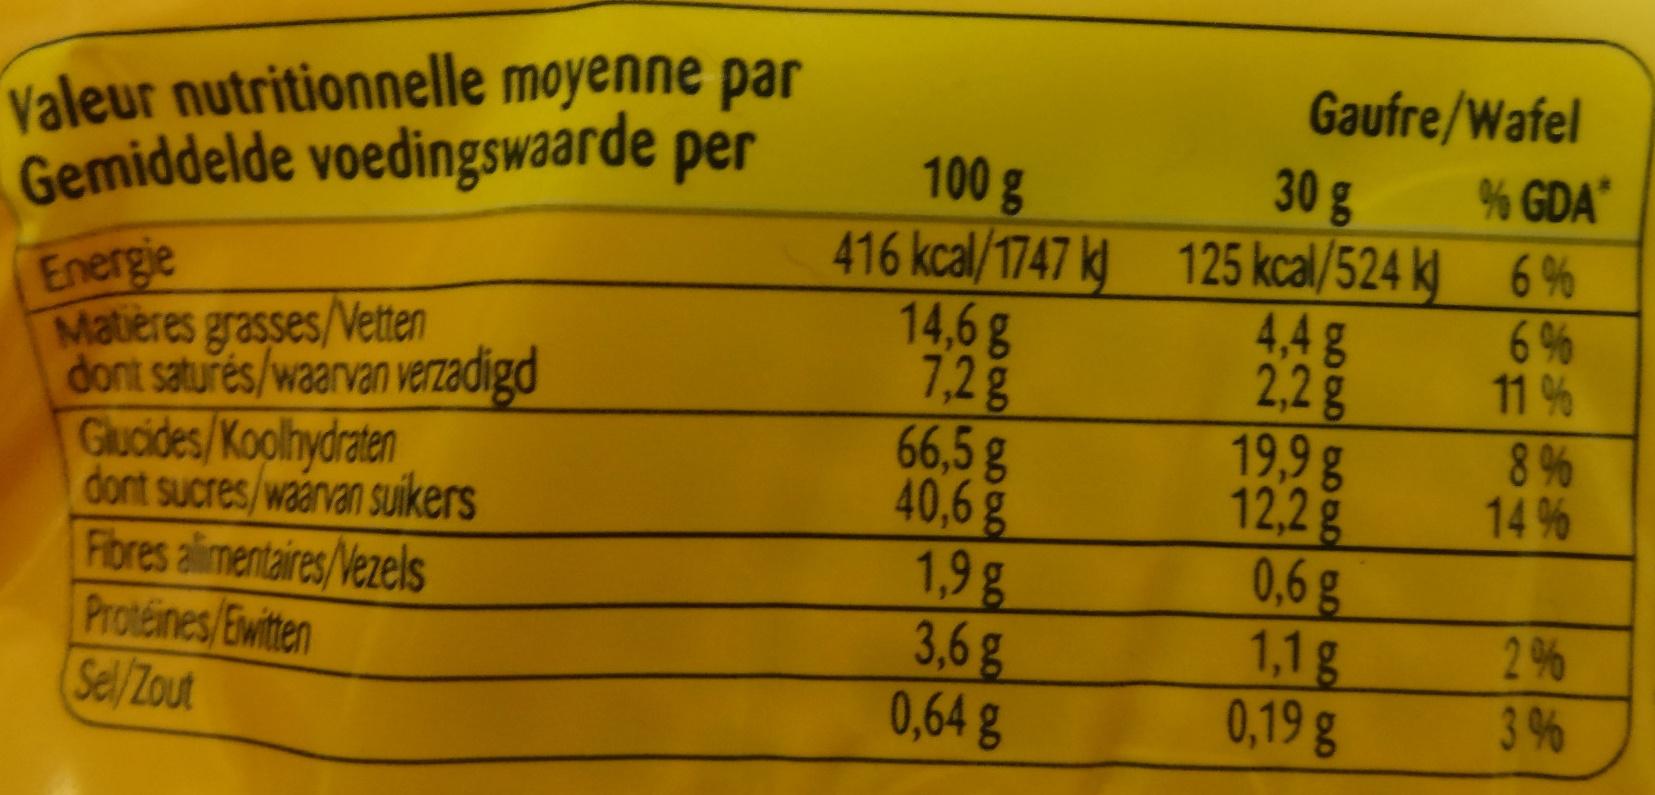 Gaufres Fourrées Vergeoise - Nutrition facts - fr